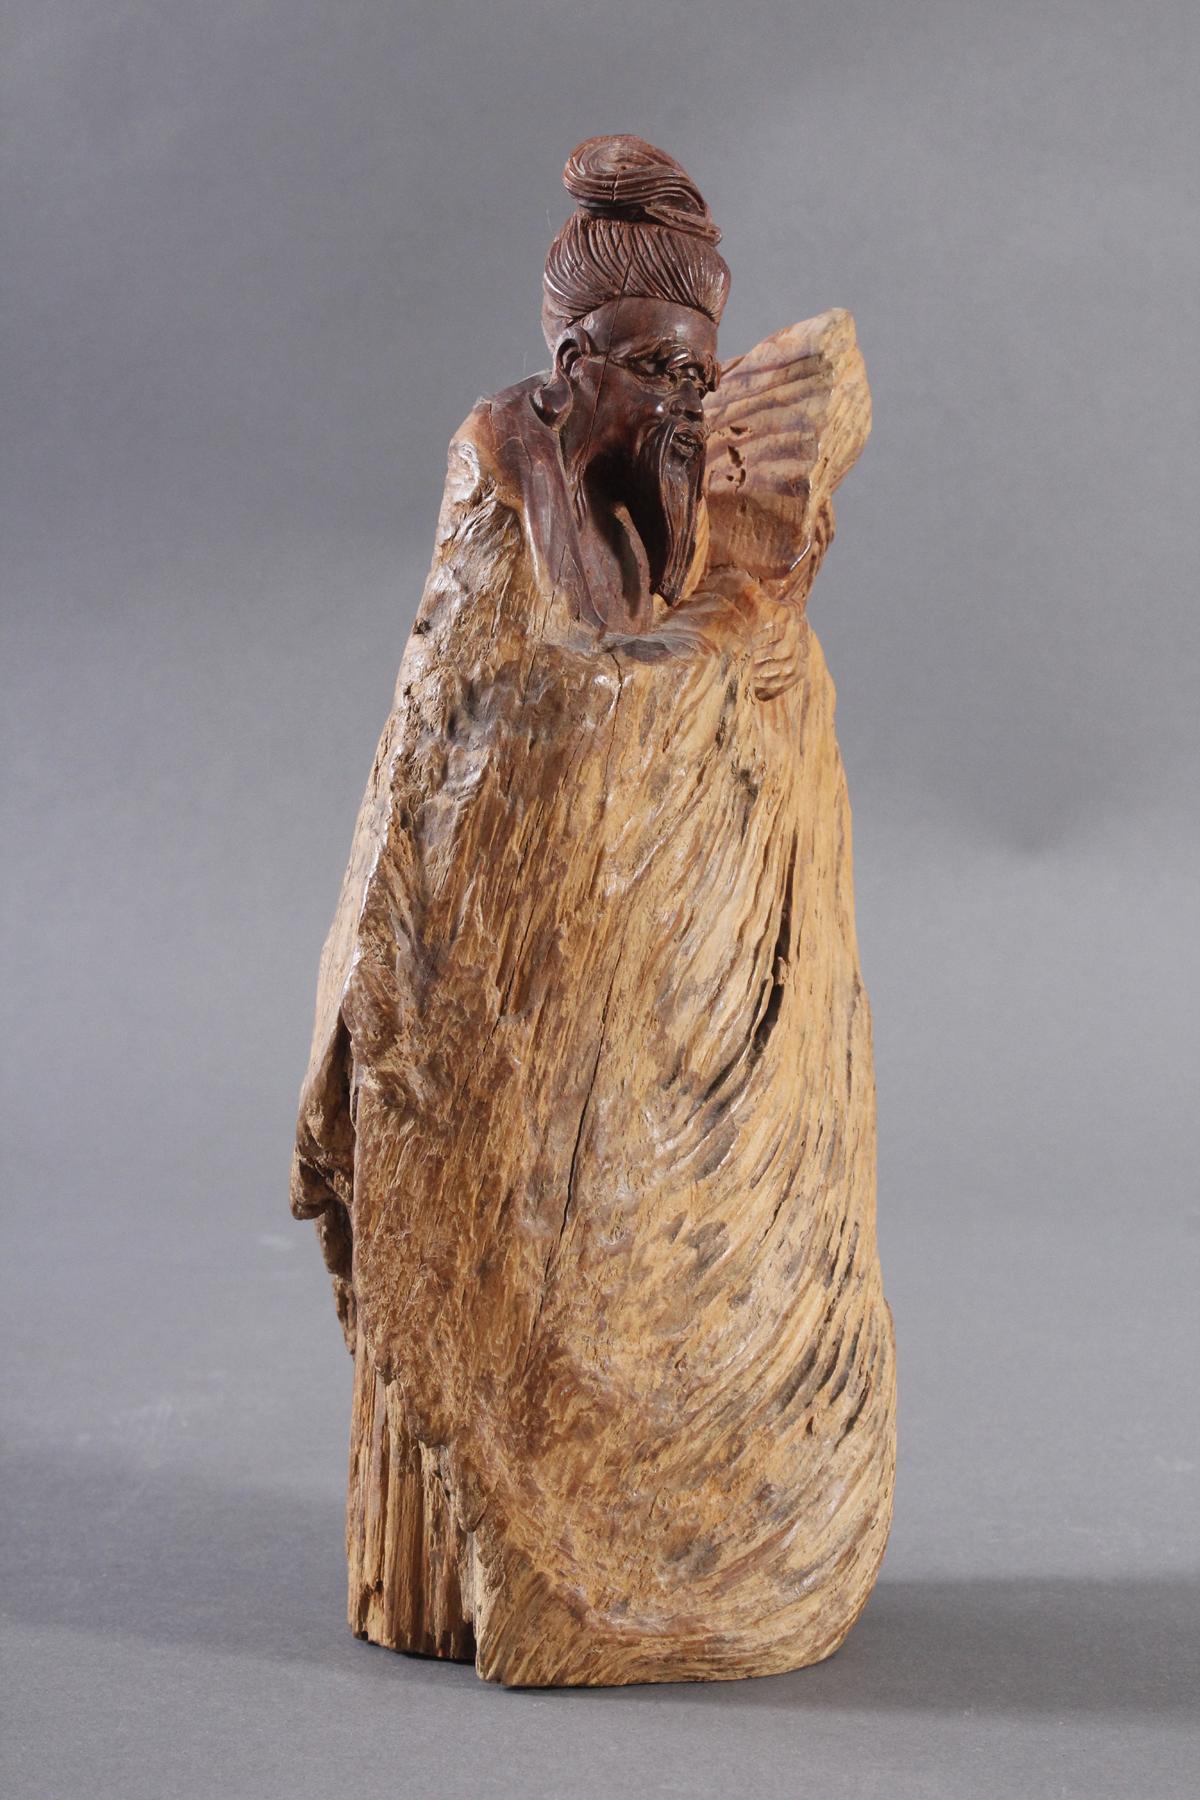 Holzskulptur, China 2. Hälfte 20. Jh. Mann mit Bart-3